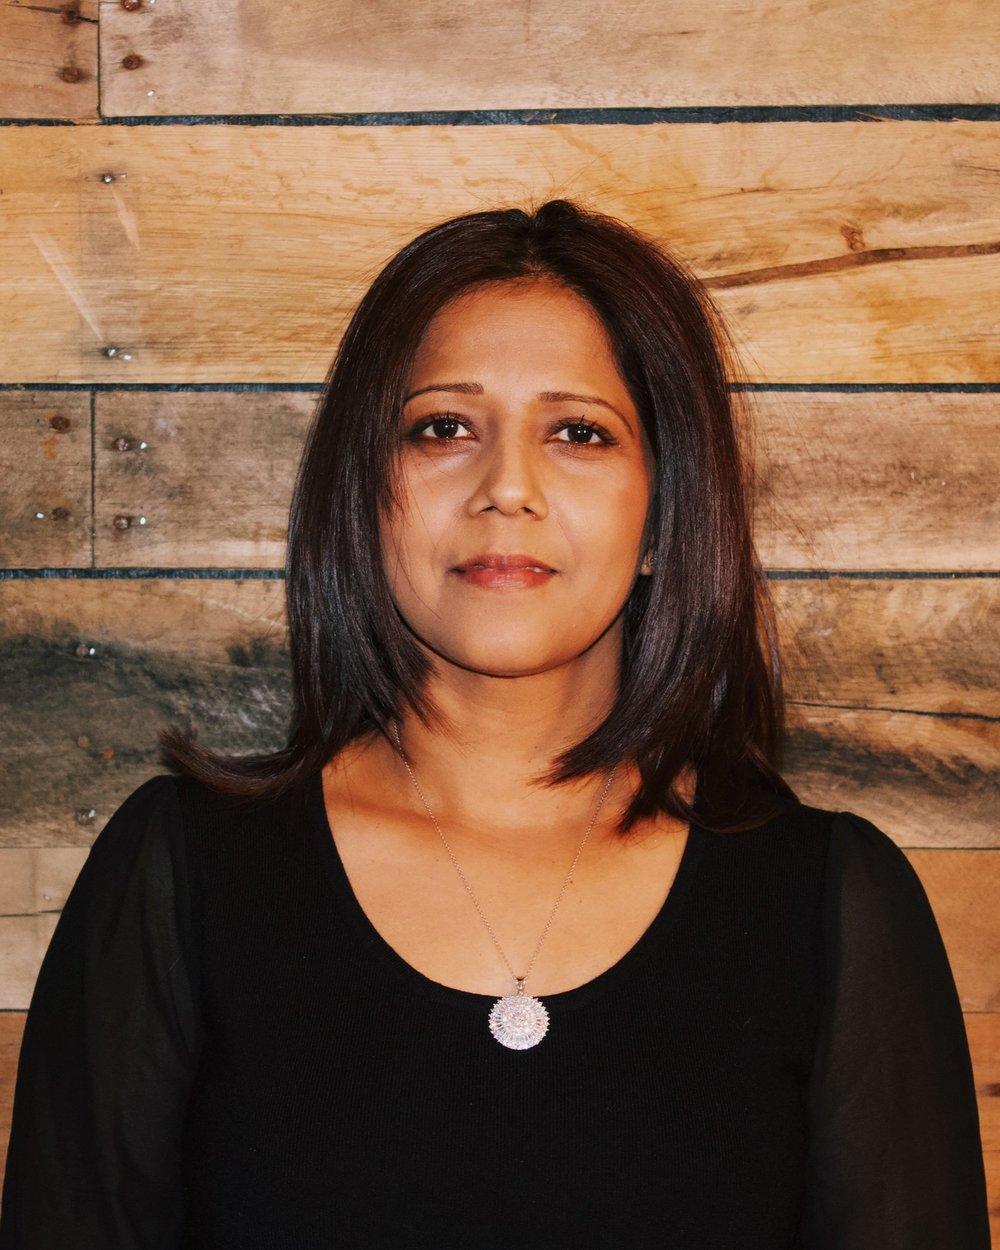 Shannie Surujpaul